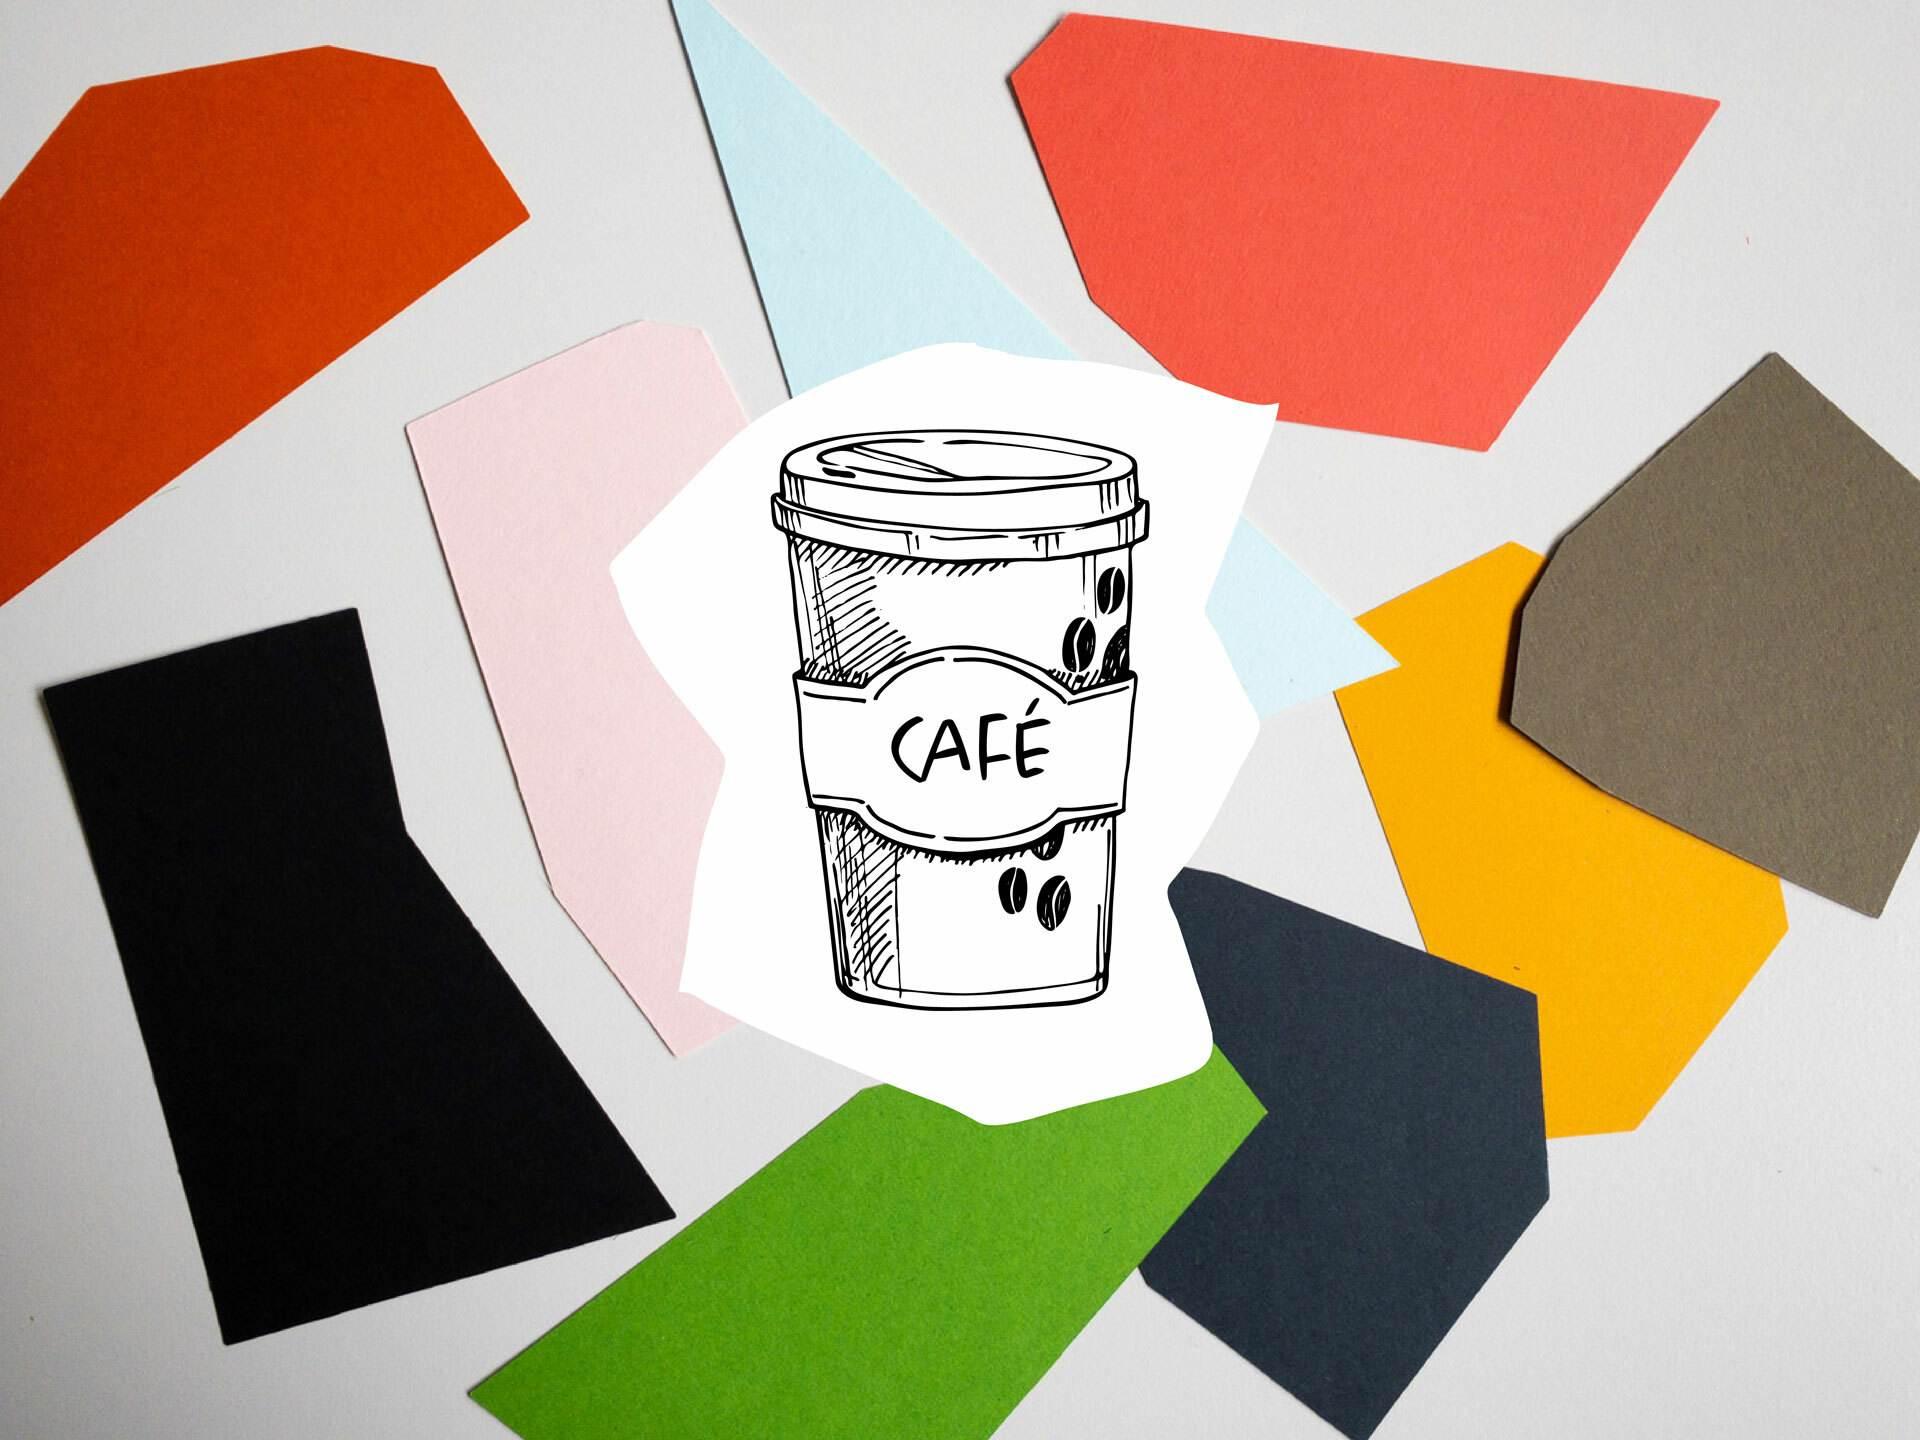 papier-cupcycled-gobelets-print-grafik-plus